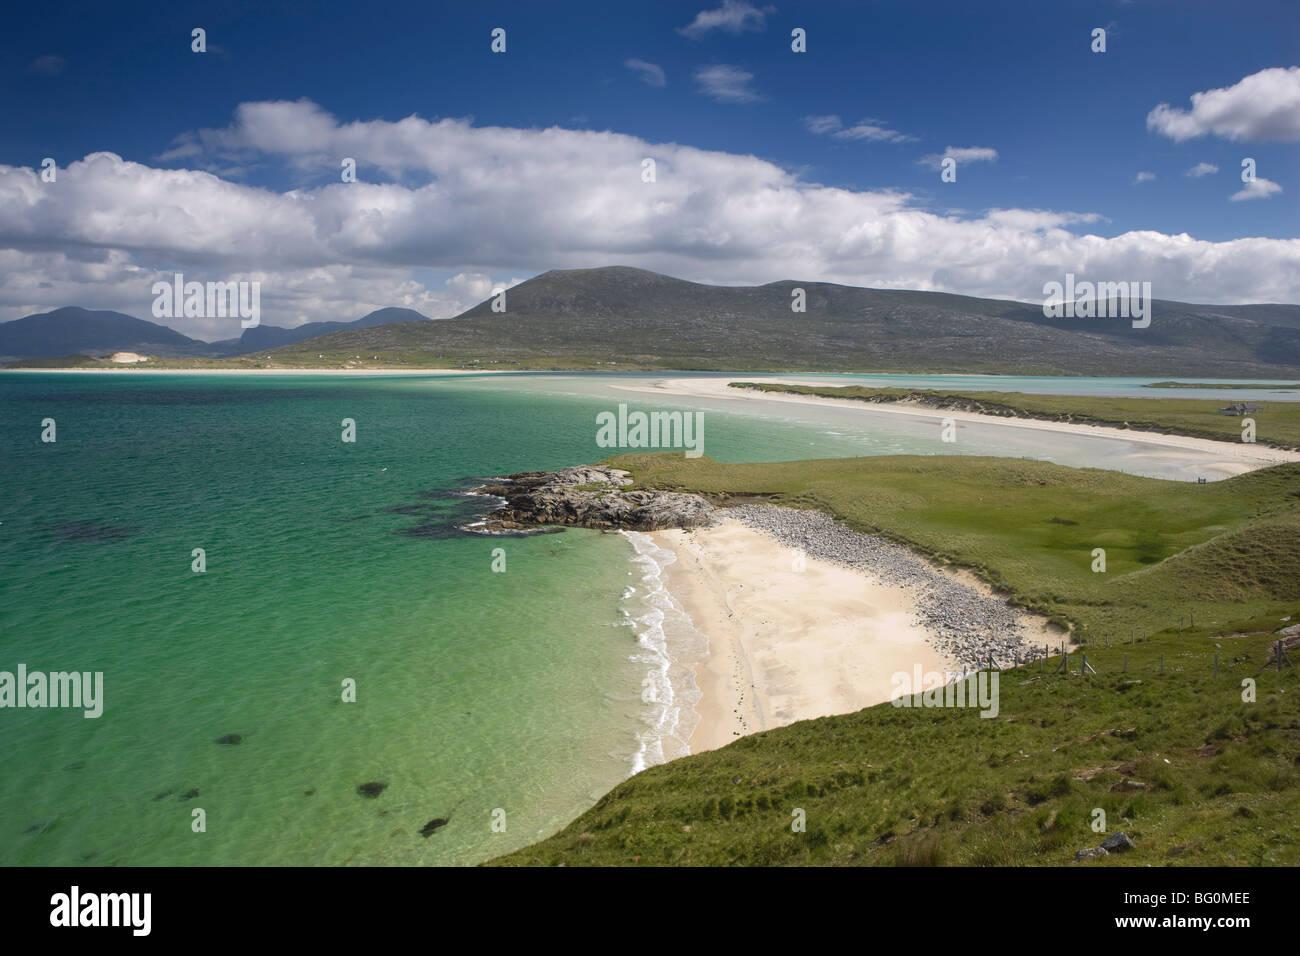 Beach at Seilebost, looking towards Luskentyre, Isle of Harris, Outer Hebrides, Scotland, United Kingdom, Europe - Stock Image